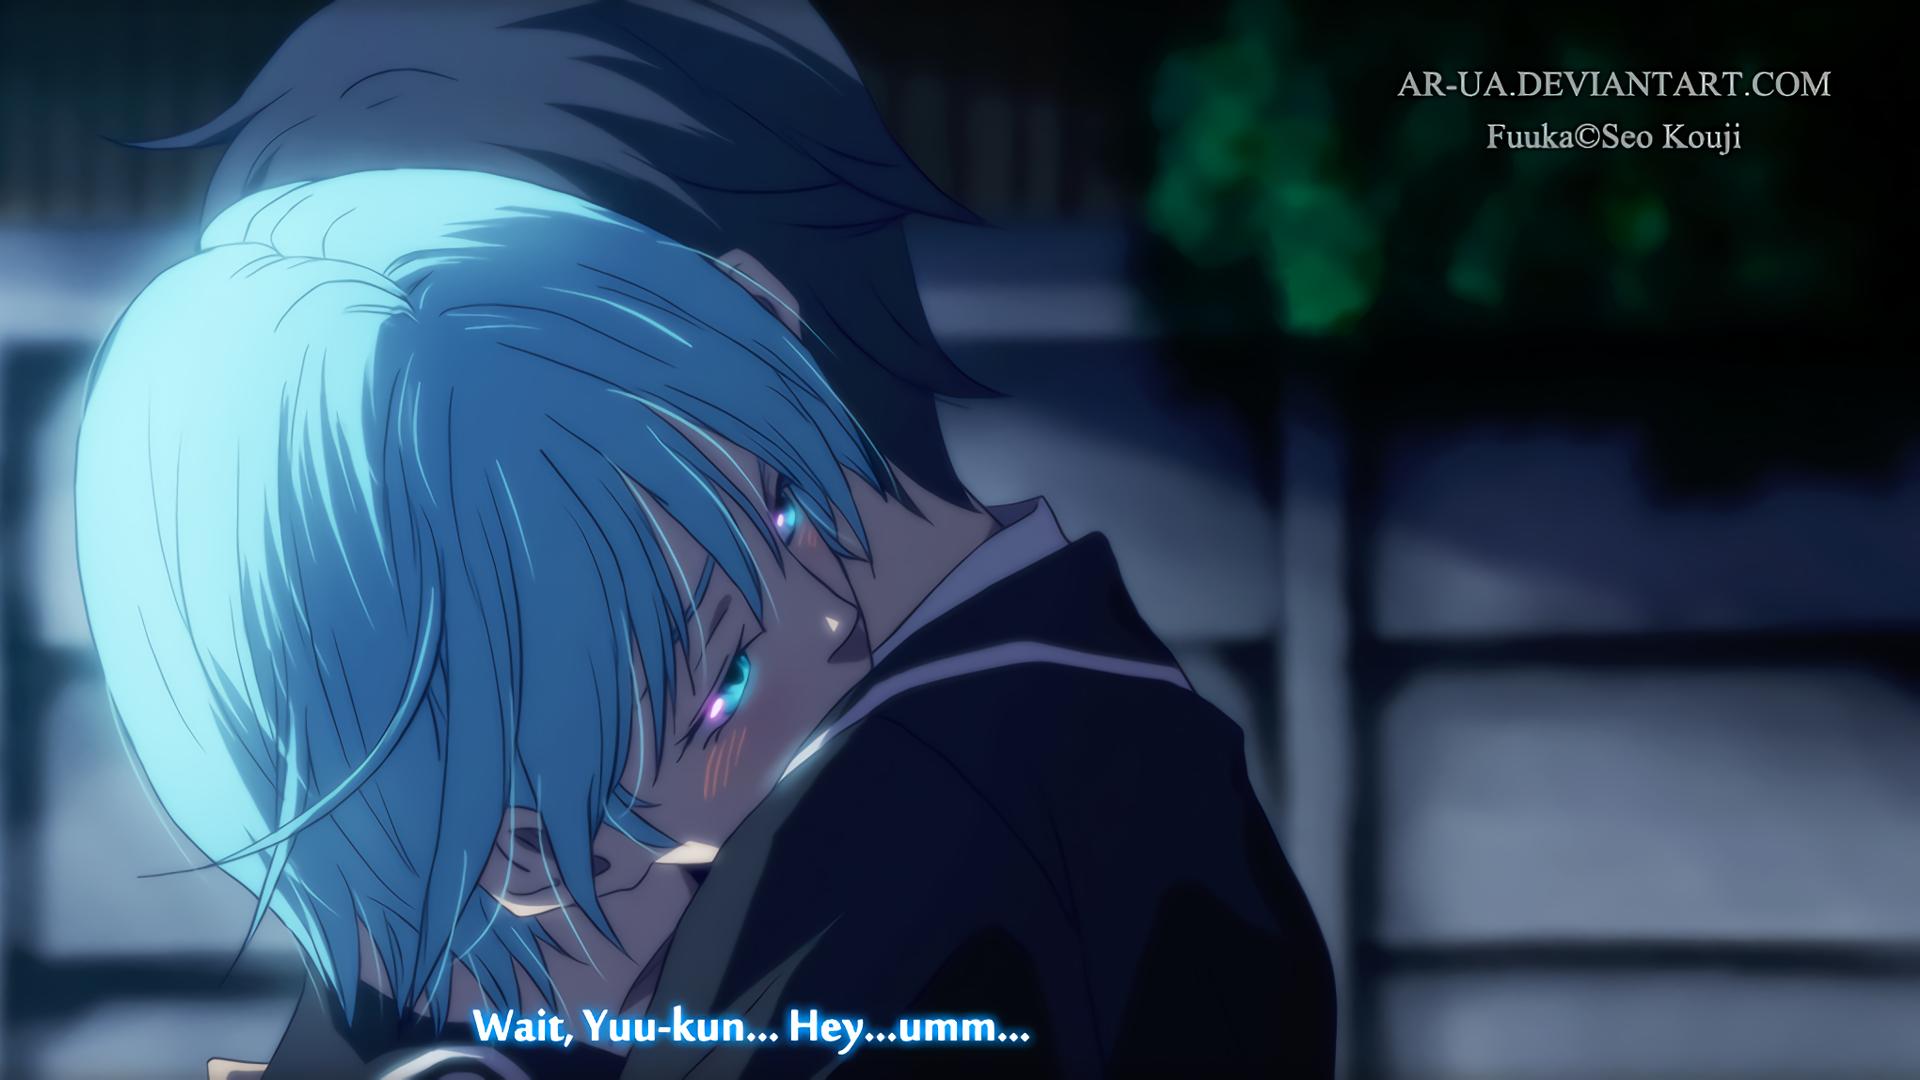 Anime Fuuka Akitsuki Bildschirmfoto Computer Tapete